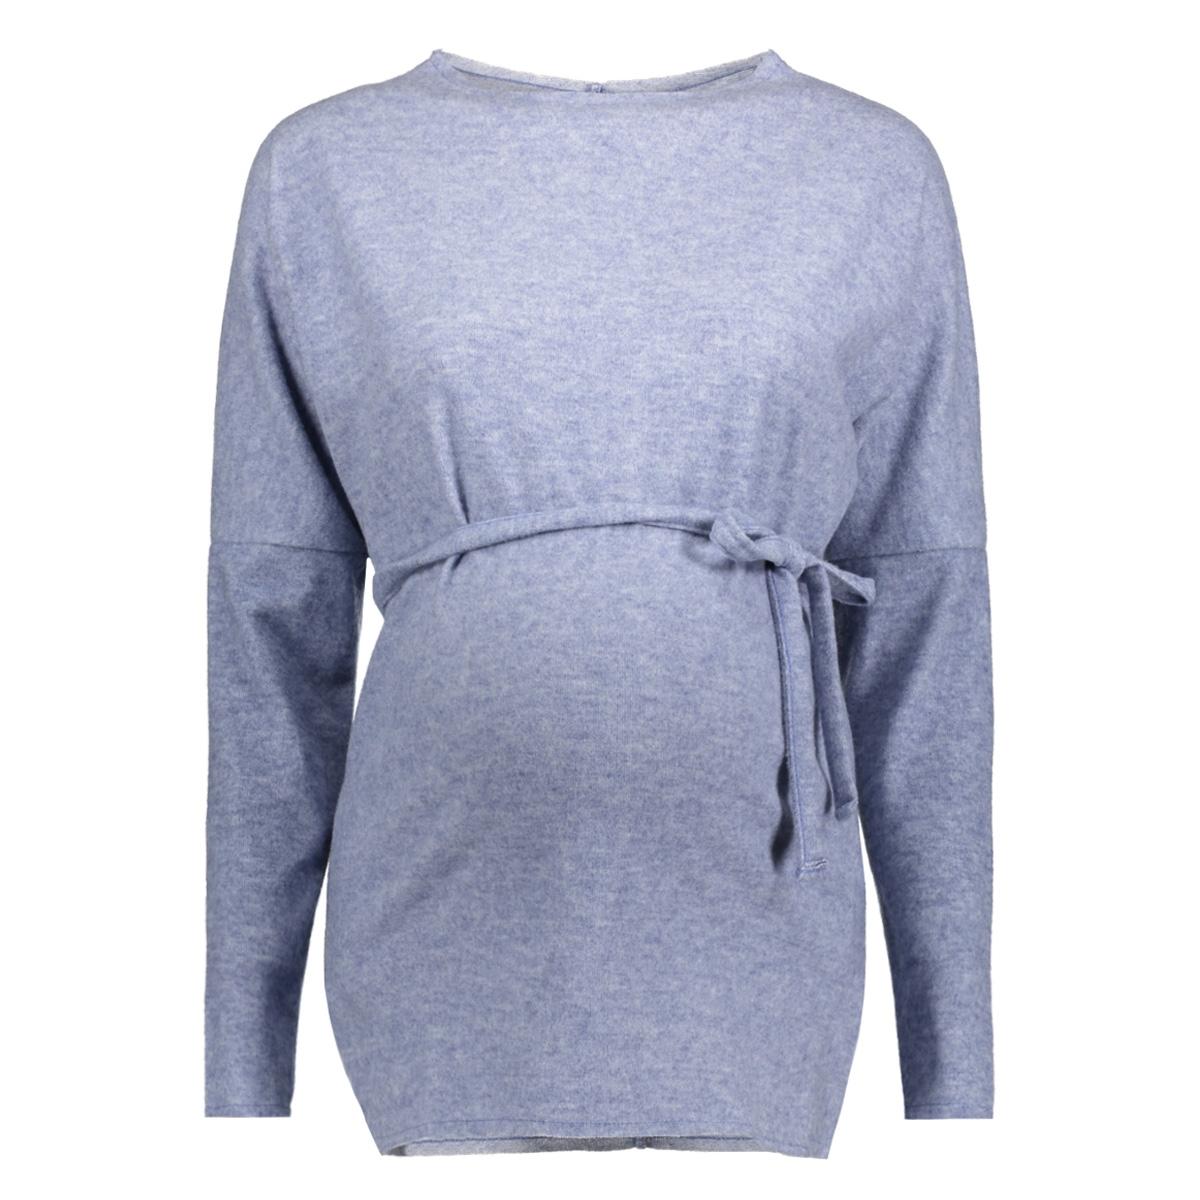 mlnashville l/s knit top 20007951 mama-licious positie trui cerulean/melange